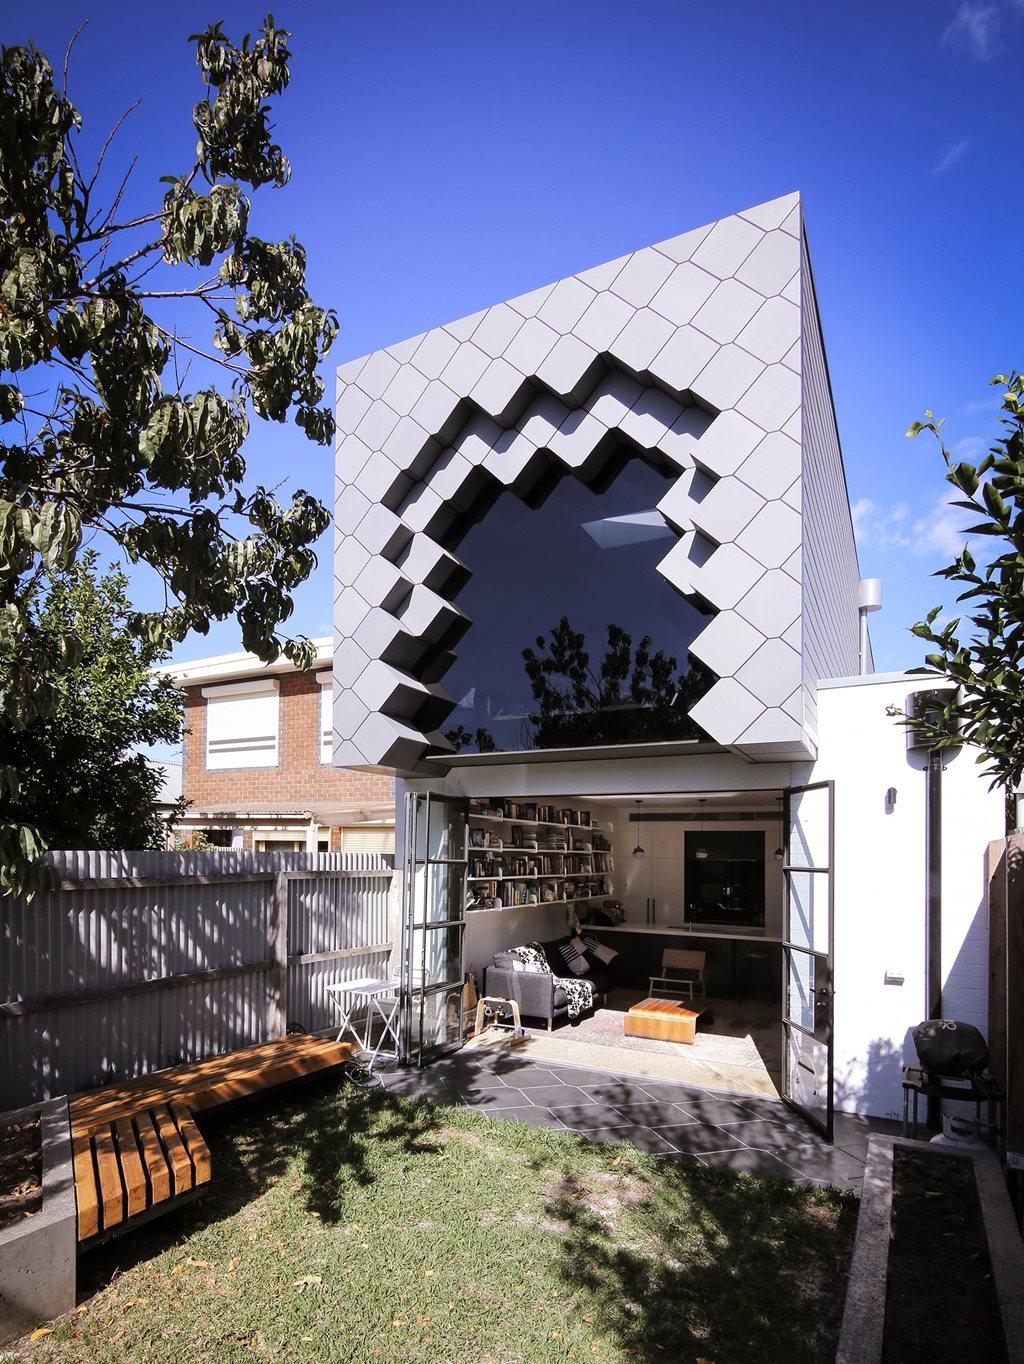 Alpolicfr a bca compliant aluminium composite material contact csp architectural nvjuhfo Image collections